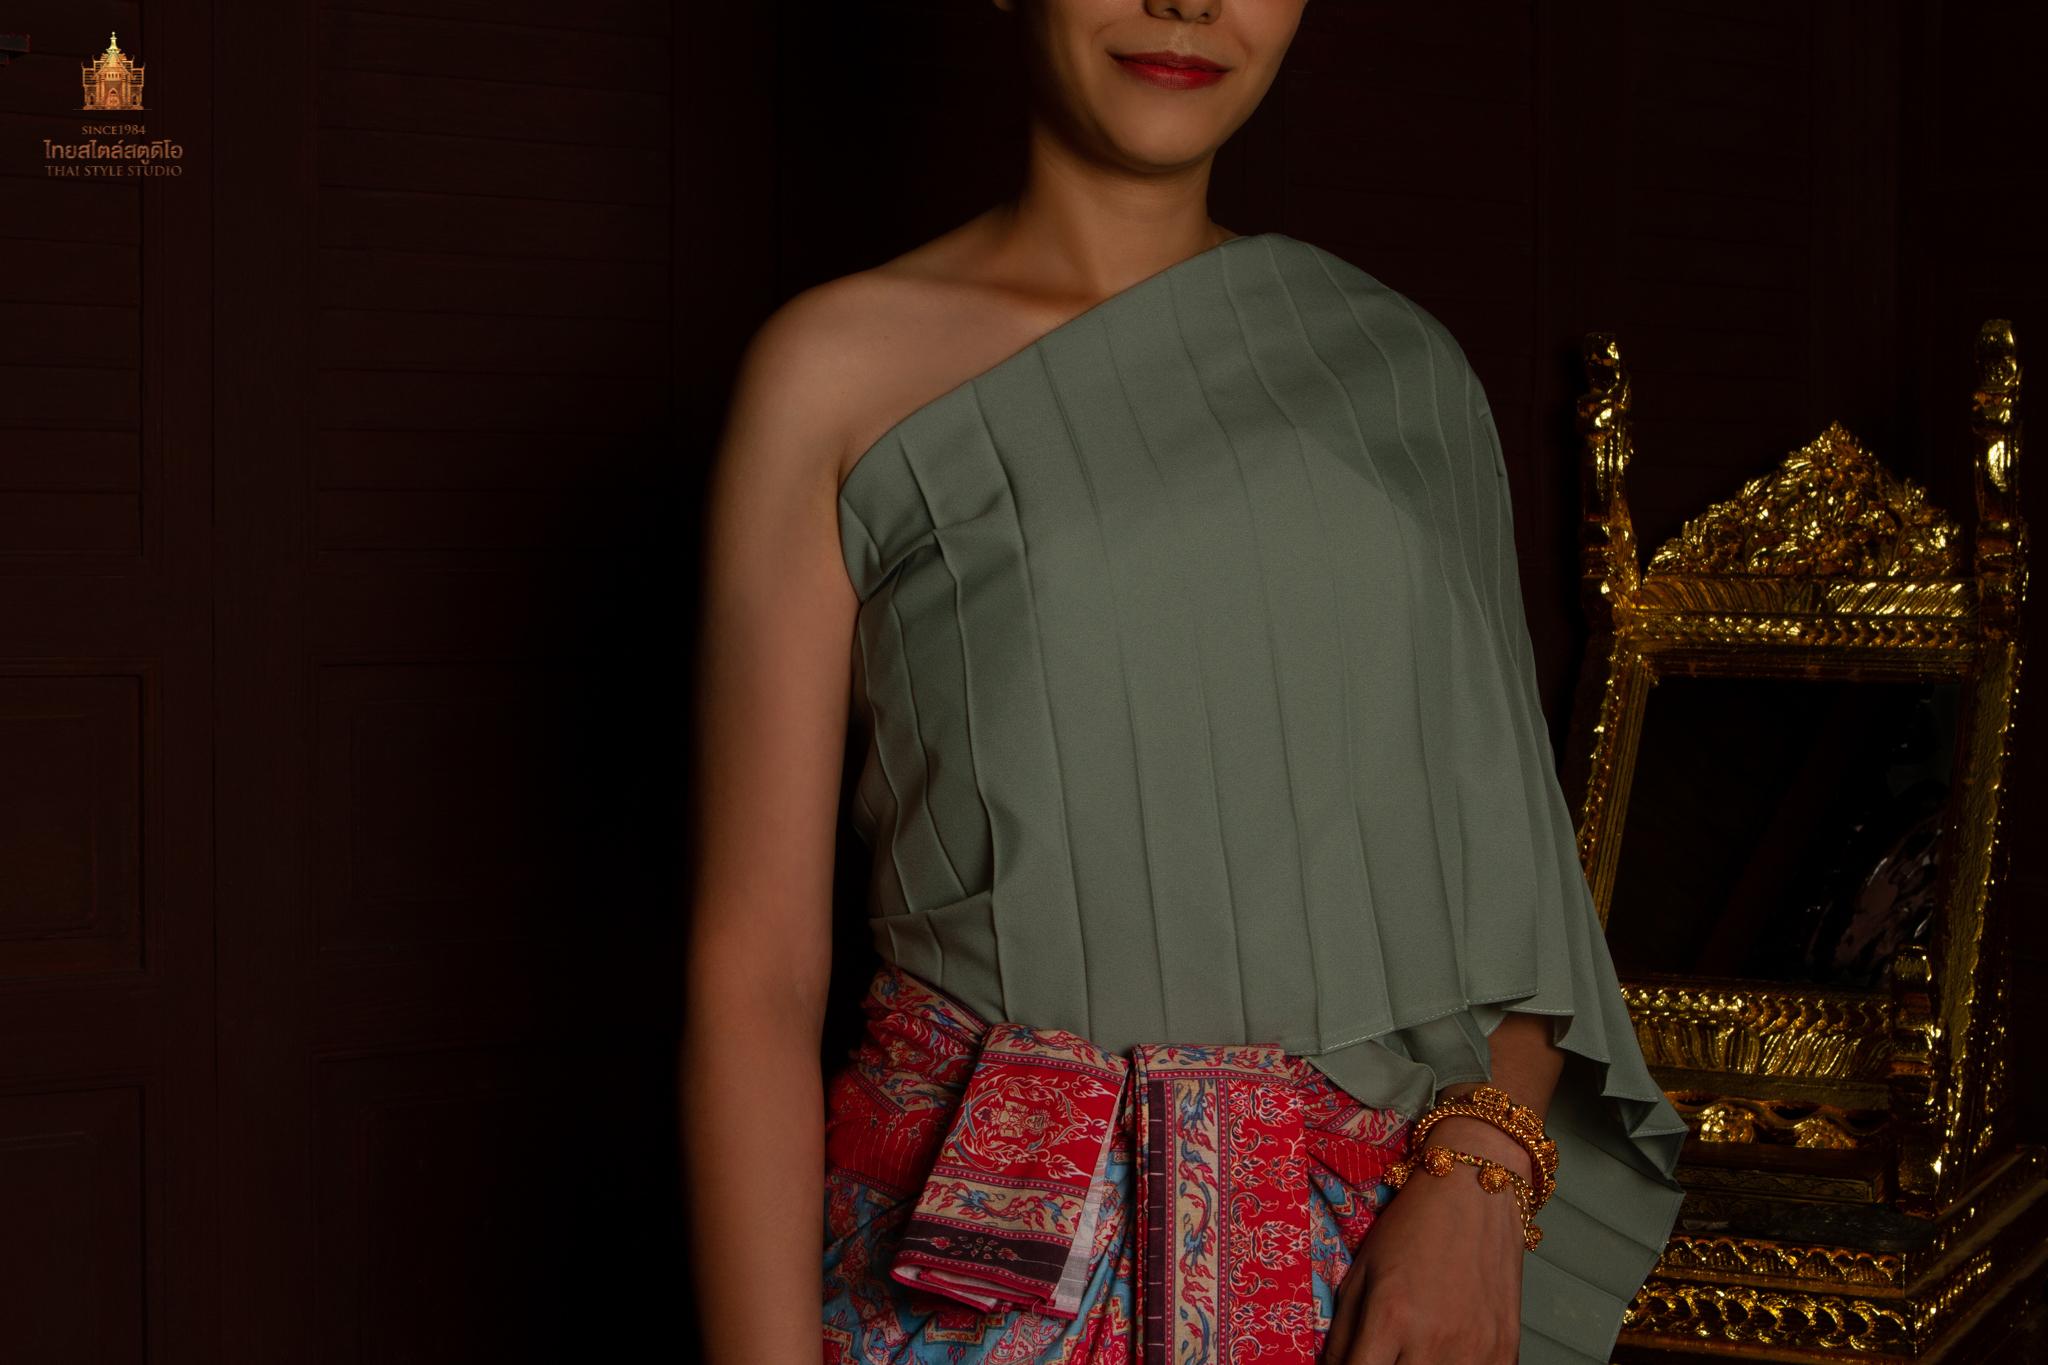 Thai Style Studio 1984 การห่มผ้าสะพัก 1